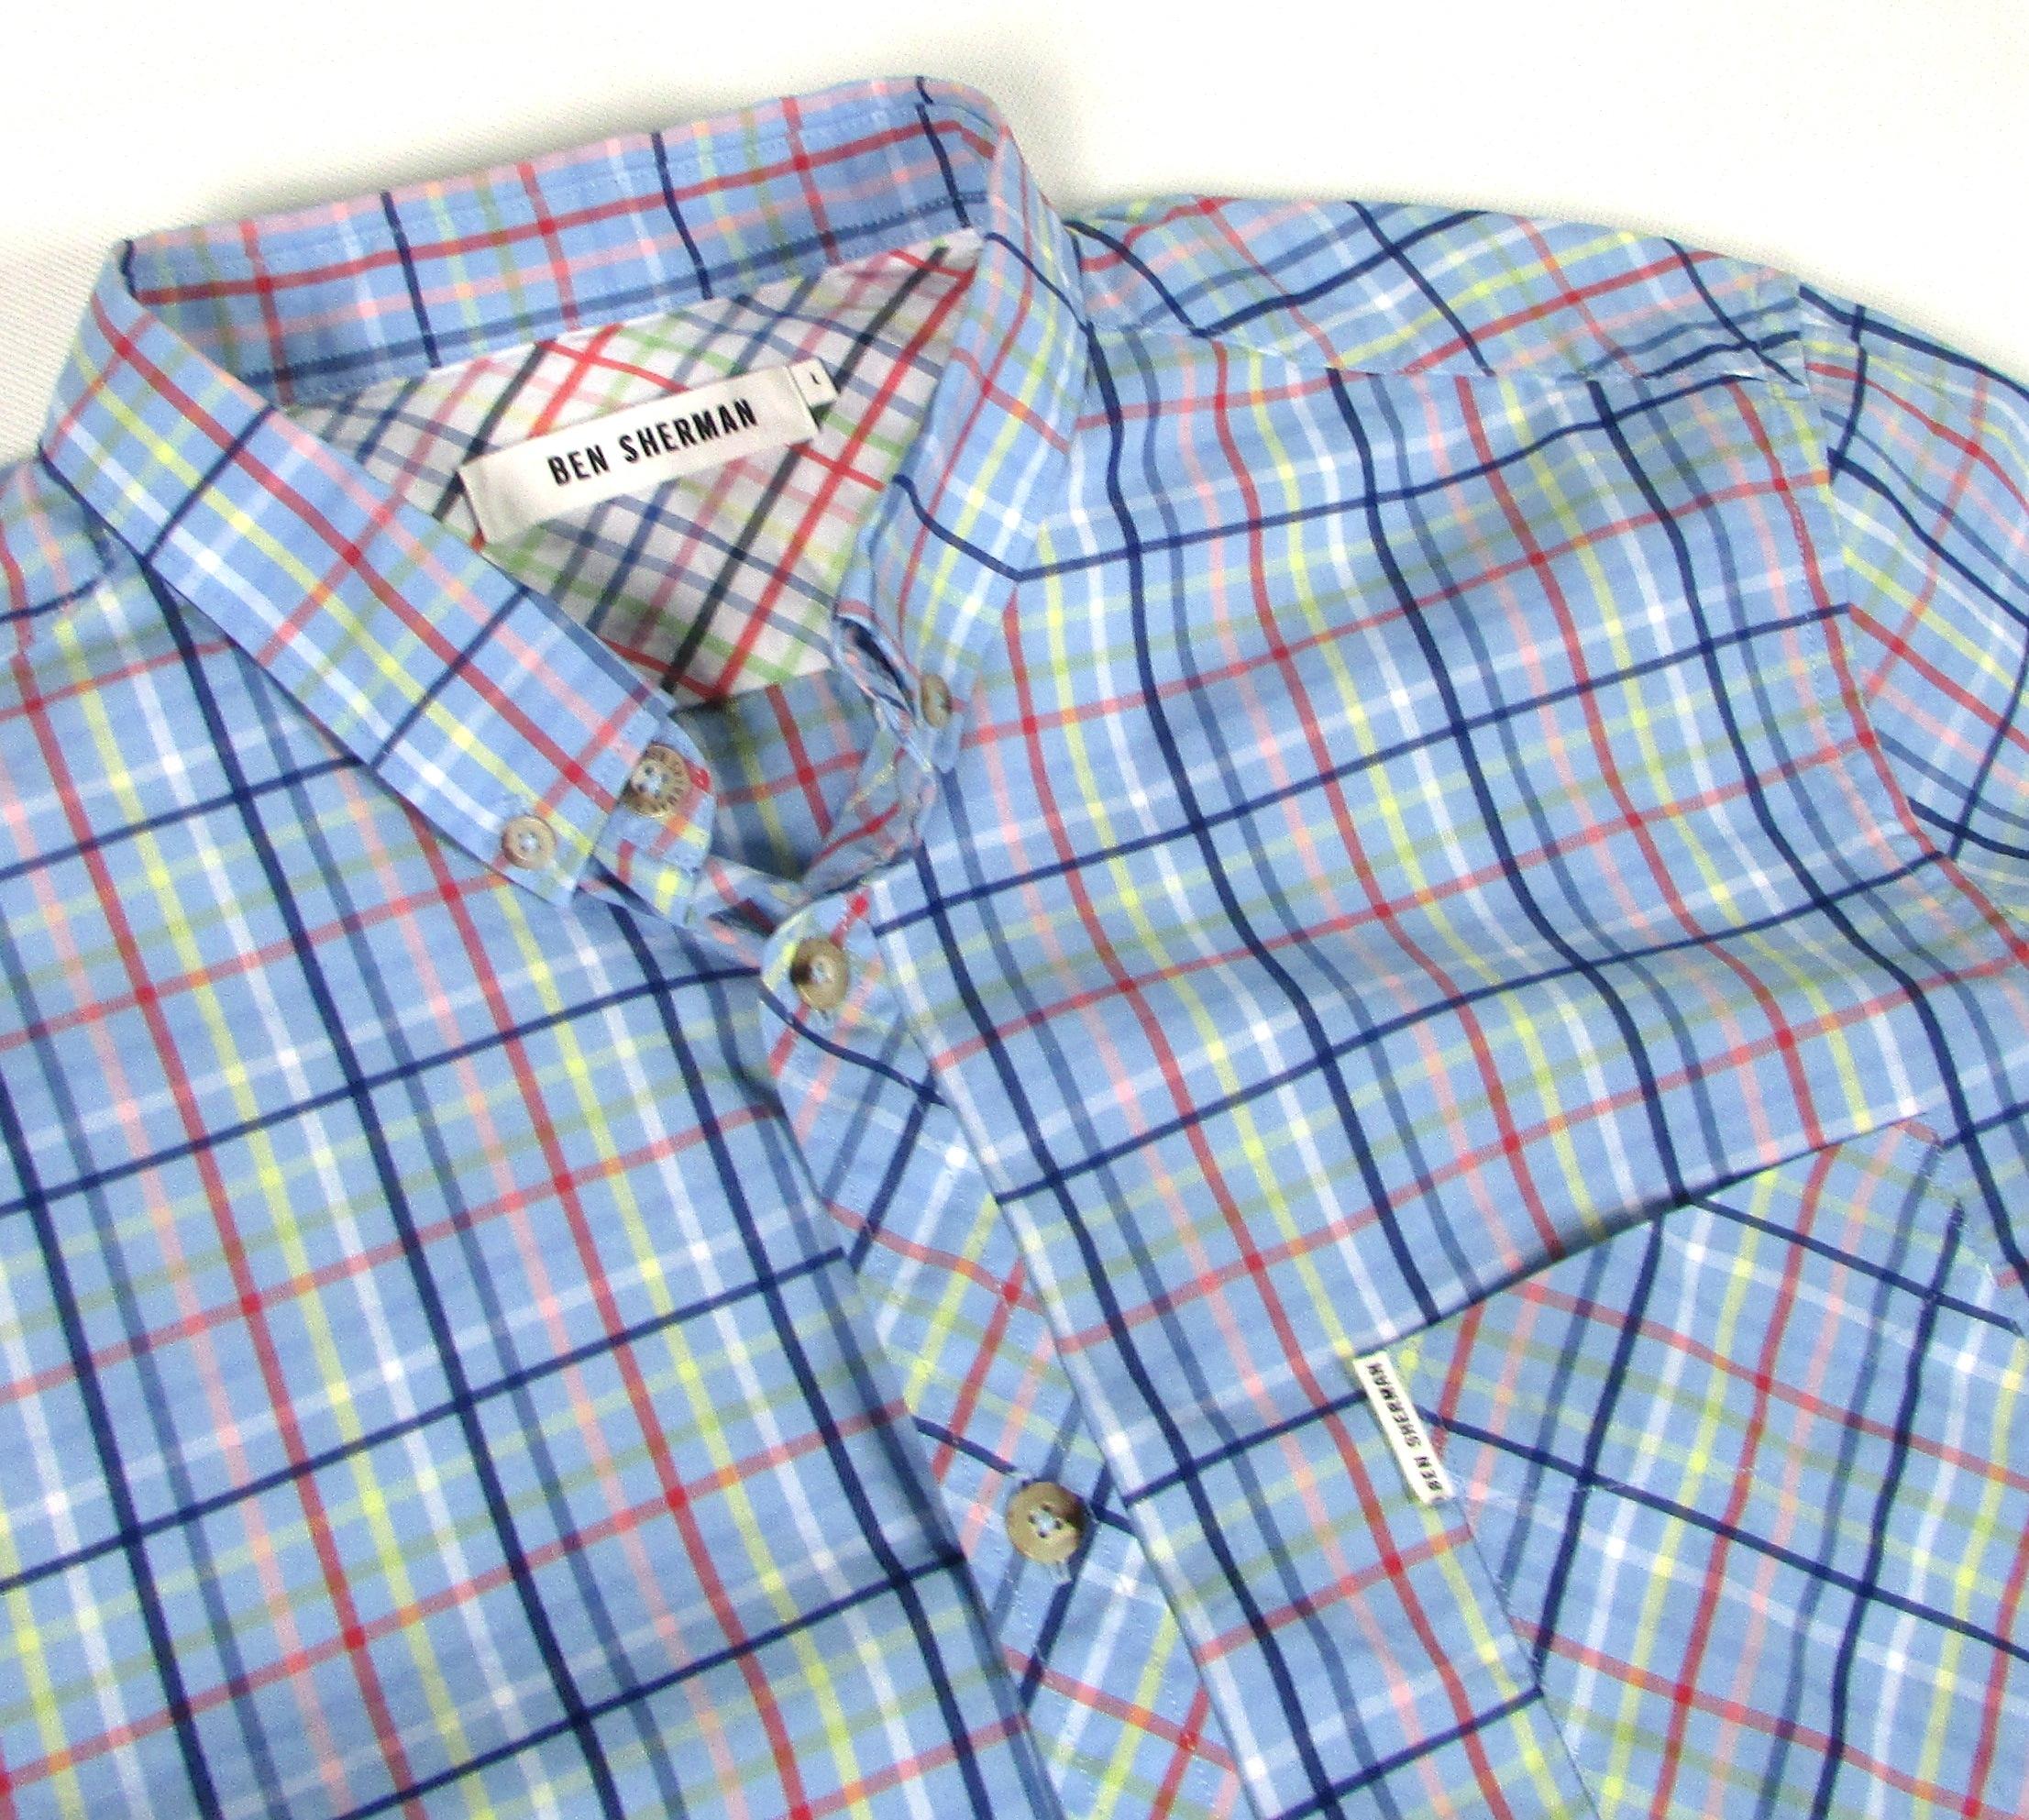 ** BEN SHERMAN **__M__Modna koszula w kratkę_IDEAŁ